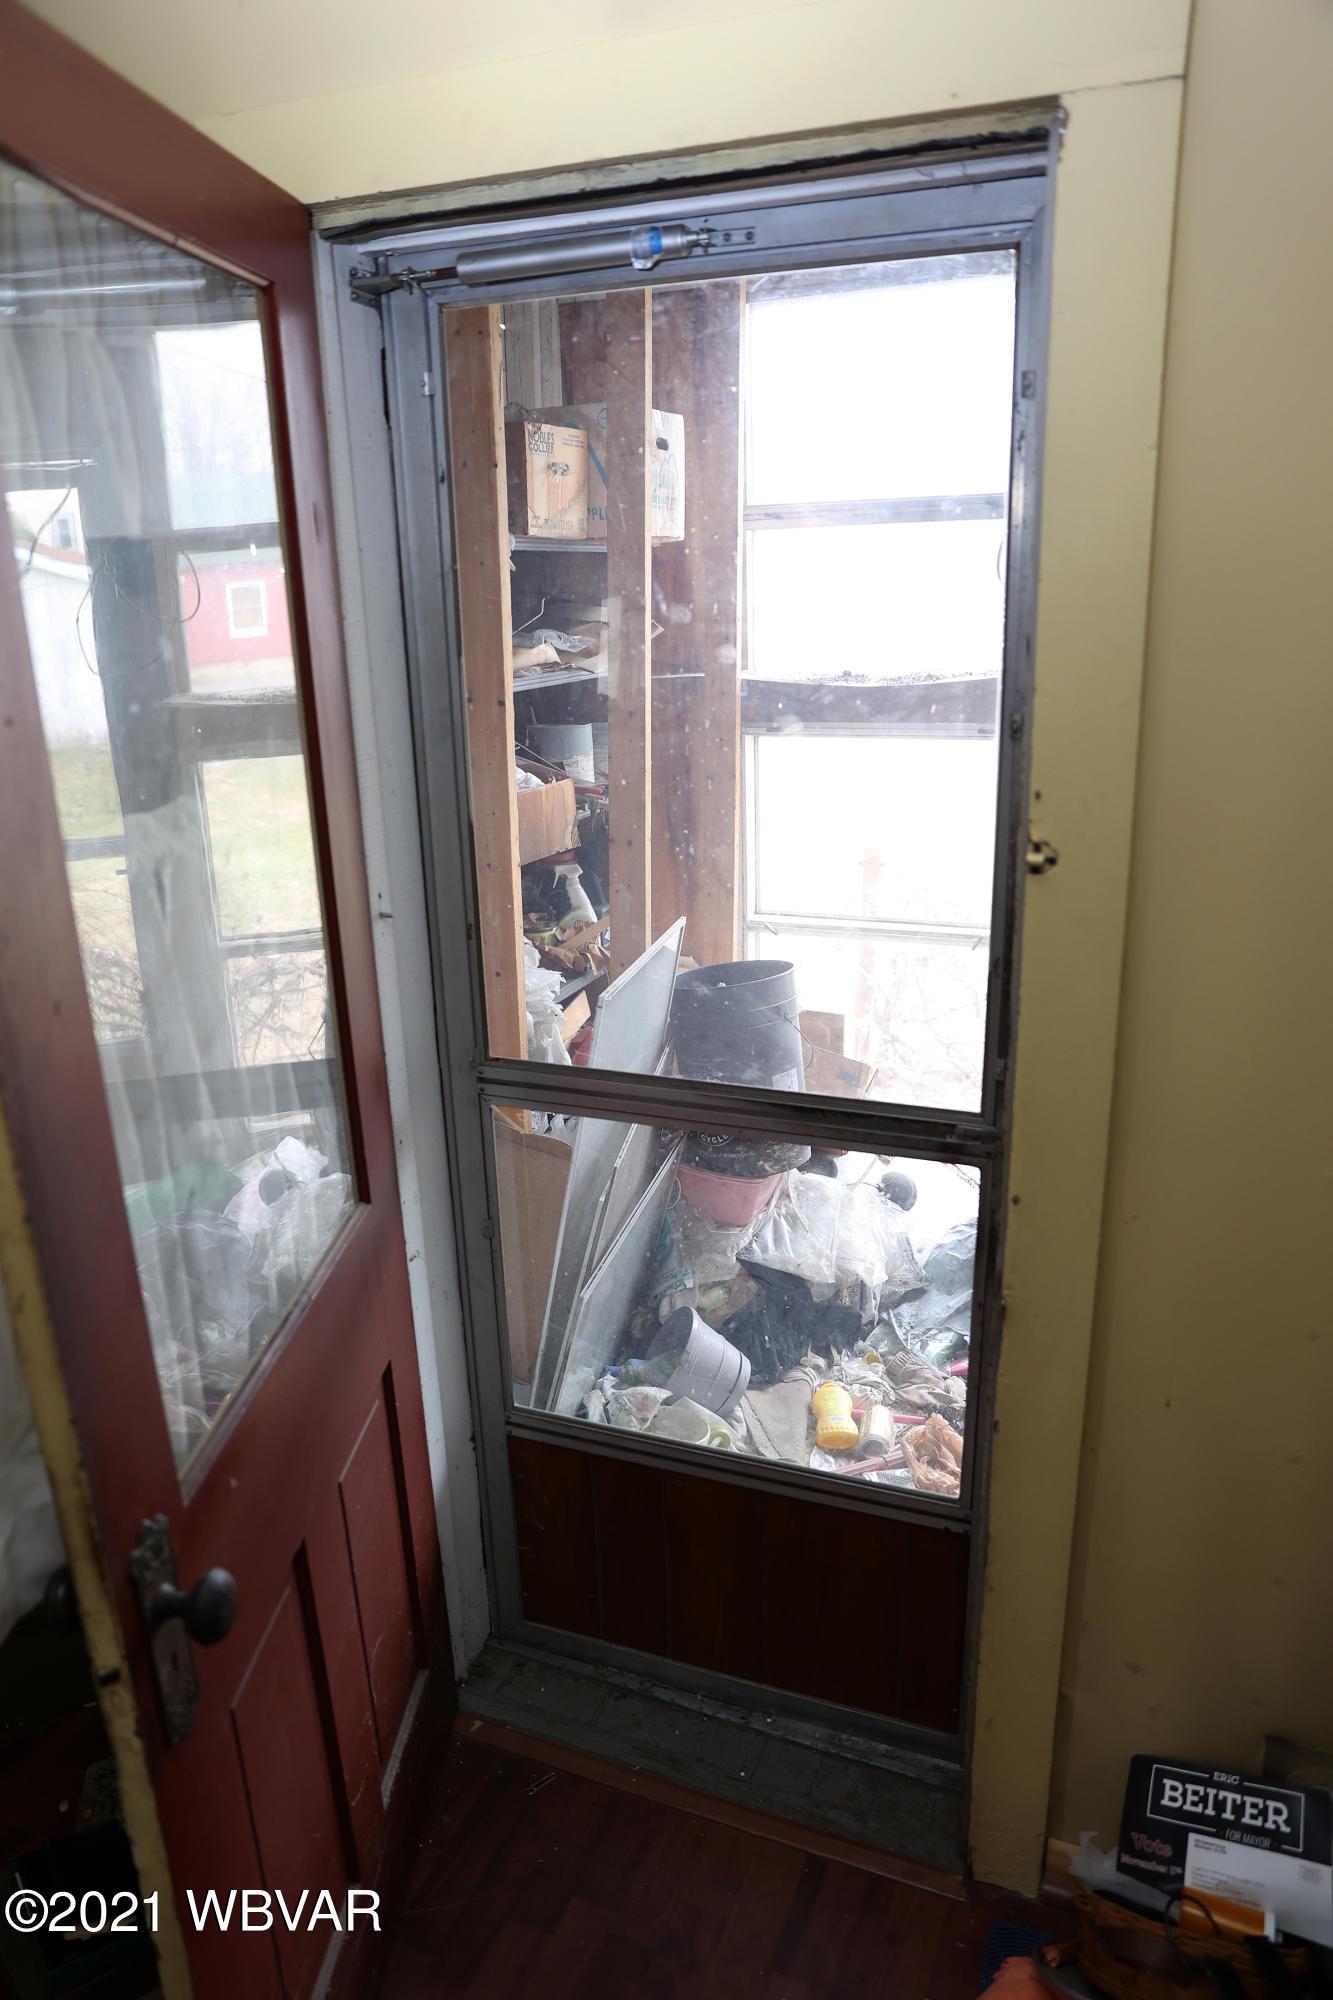 720 DIAMOND STREET, Williamsport, PA 17701, 3 Bedrooms Bedrooms, ,1 BathroomBathrooms,Residential,For sale,DIAMOND,WB-92252